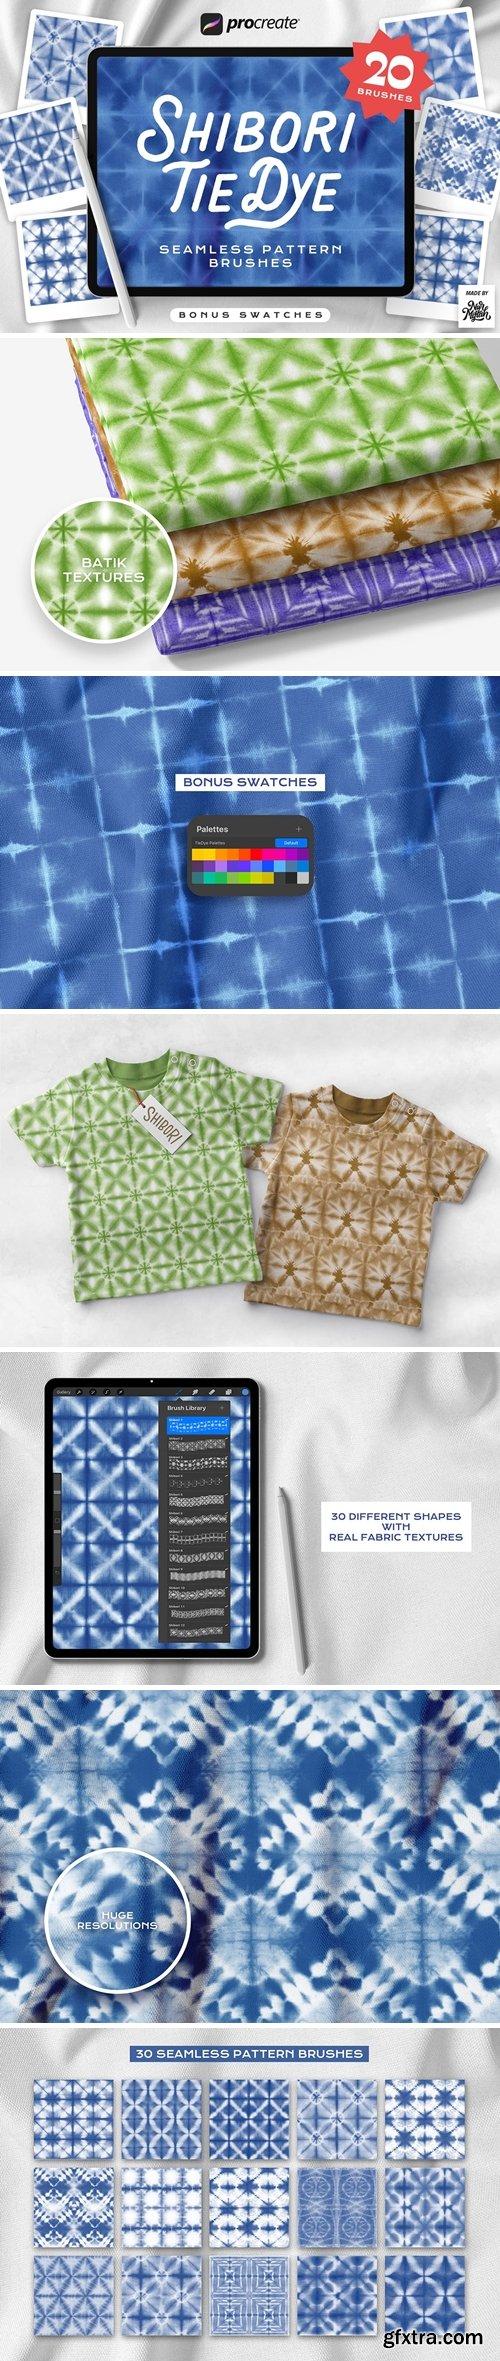 Procreate Tie Dye Shibori Seamless Pattern Brushes